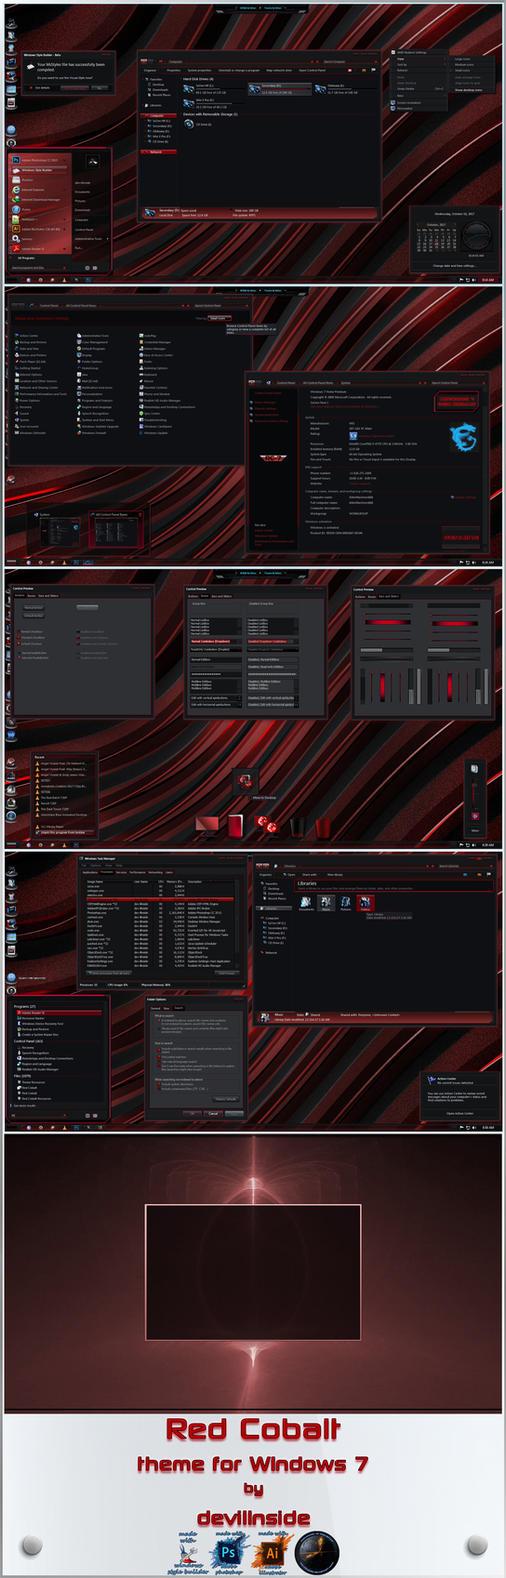 Red Cobalt version 1.1 by devillnside